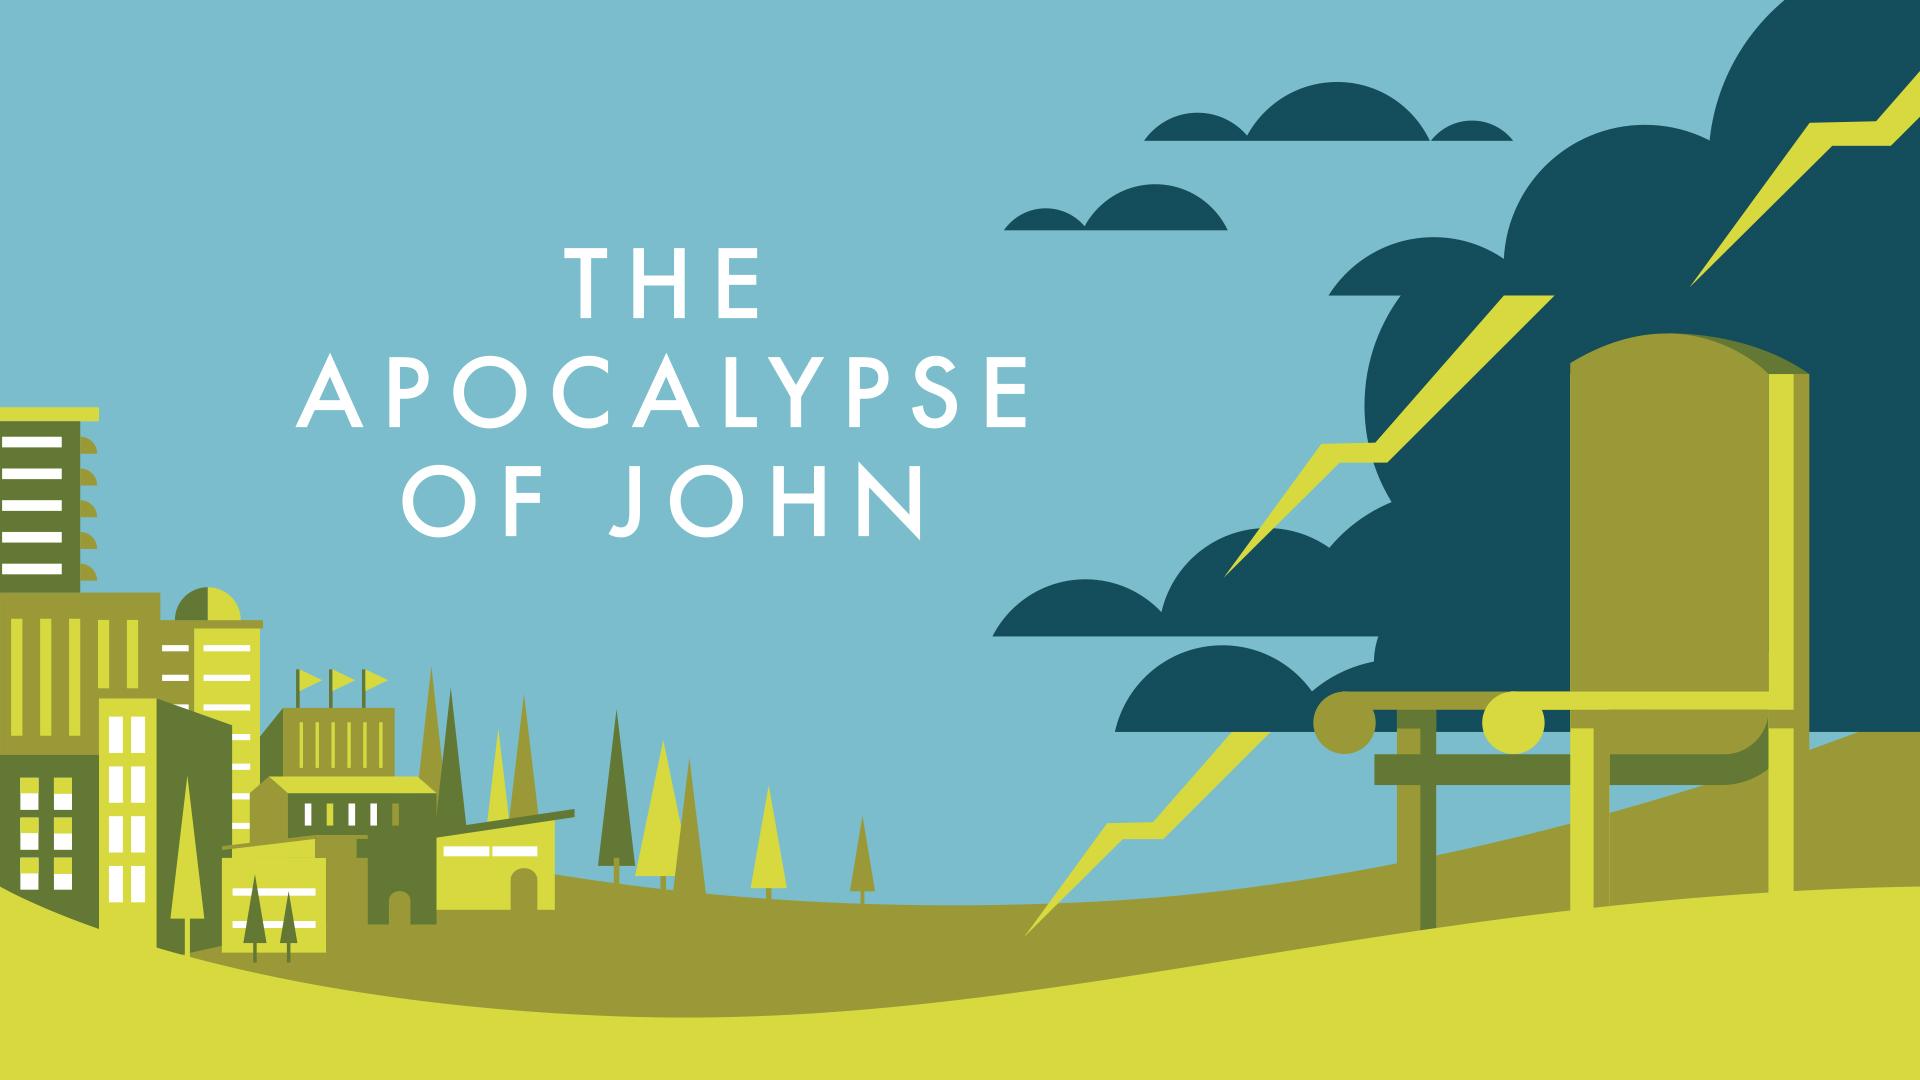 Revelation: The Apocalypse of John